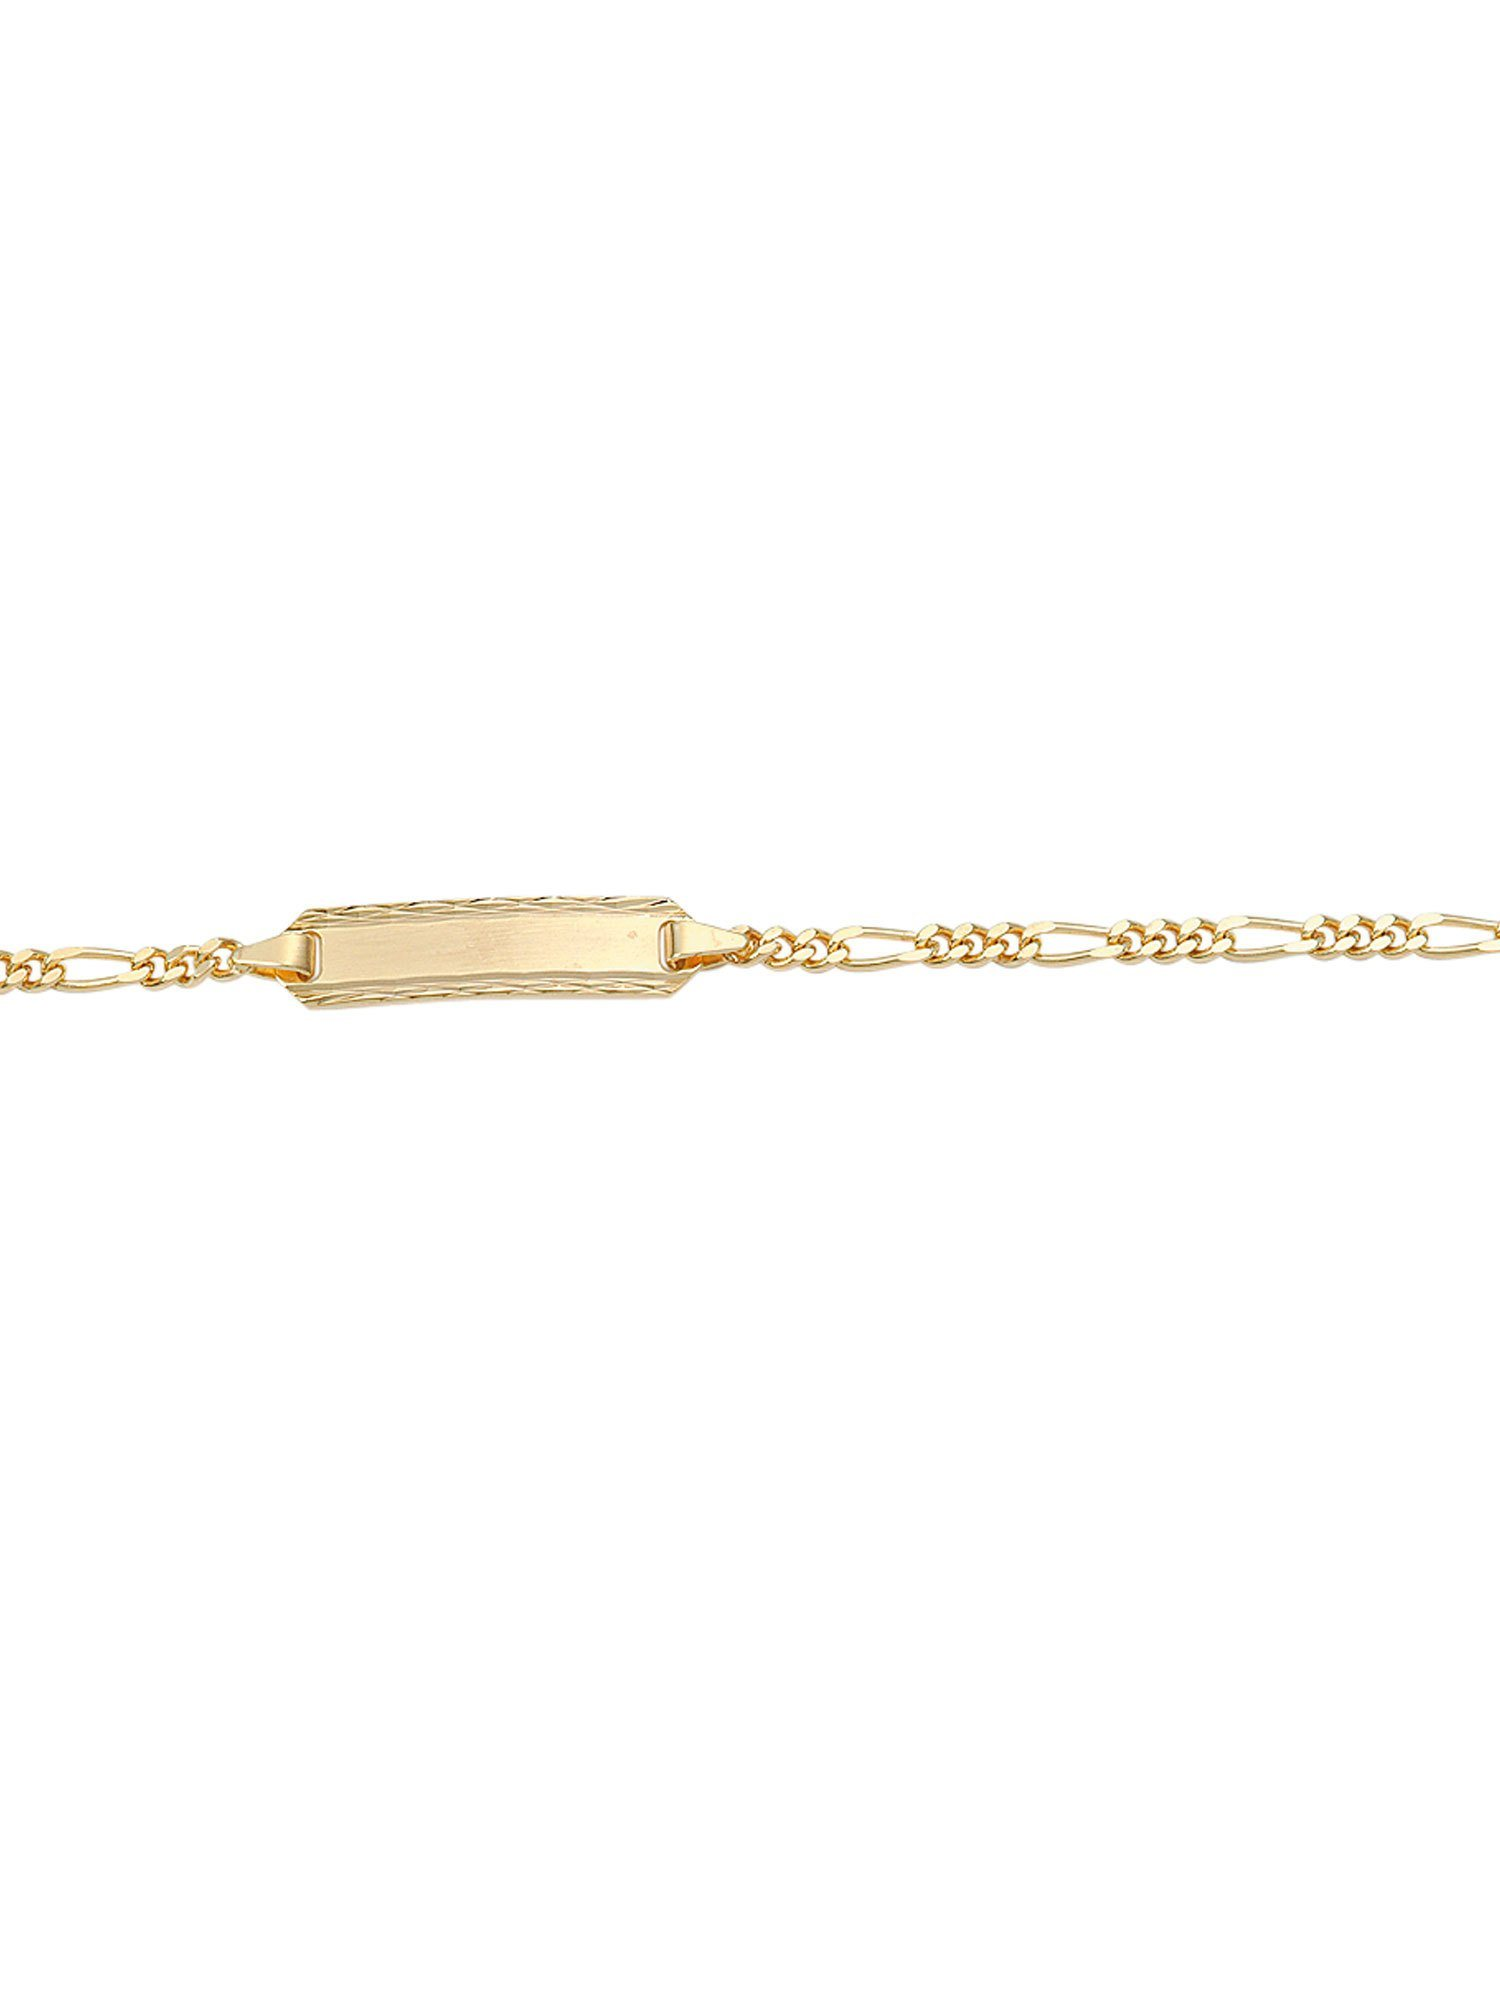 Adelia´s Goldarmband »Gold Armbänder« 8 k 333 Gelbgold Figarokette   Schmuck > Halsketten > Goldketten   Adelia´s